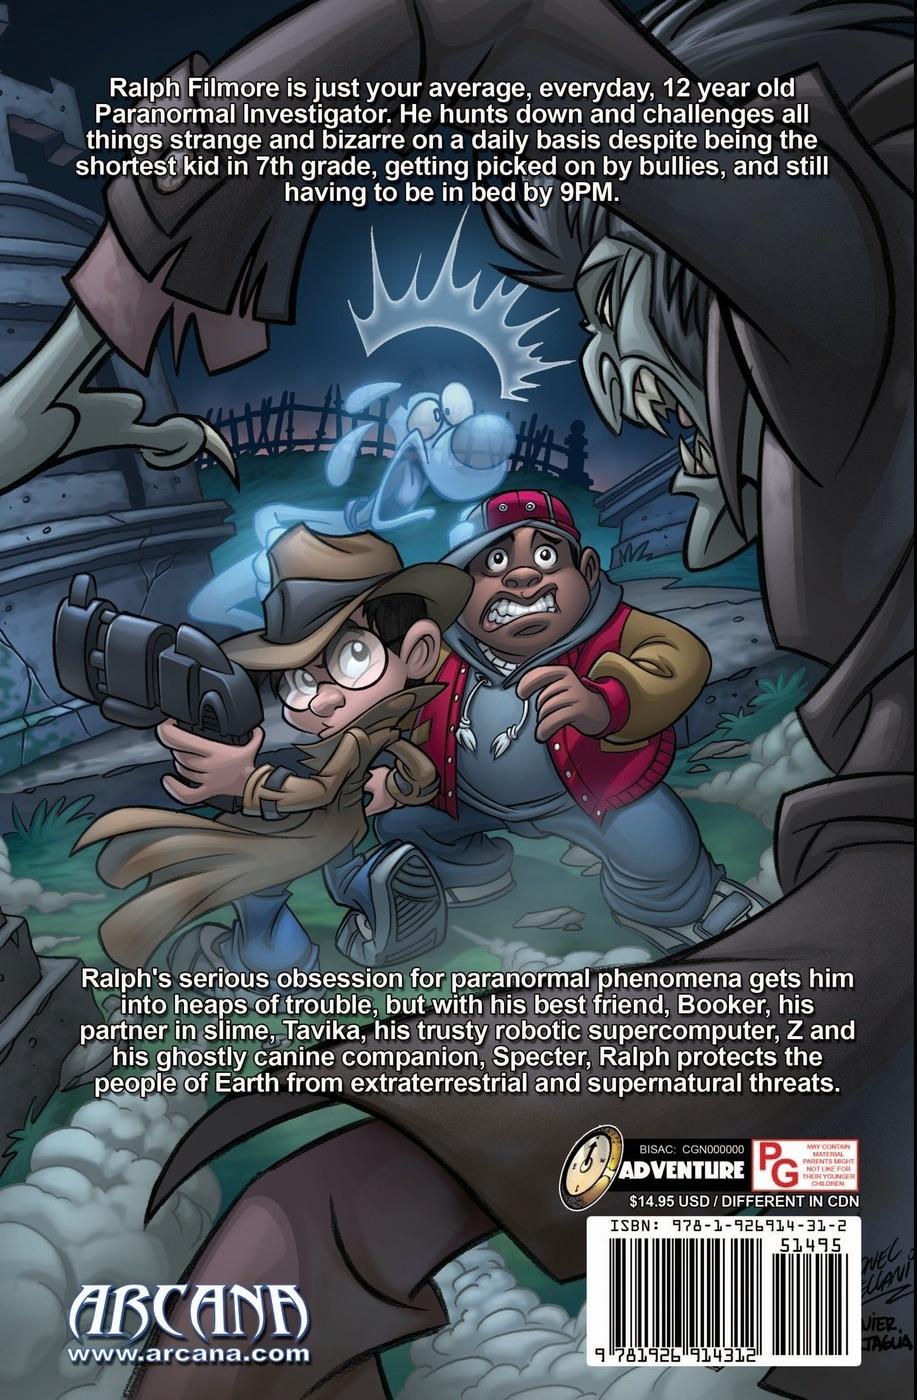 Read online Ralph Filmore comic -  Issue # Full - 108